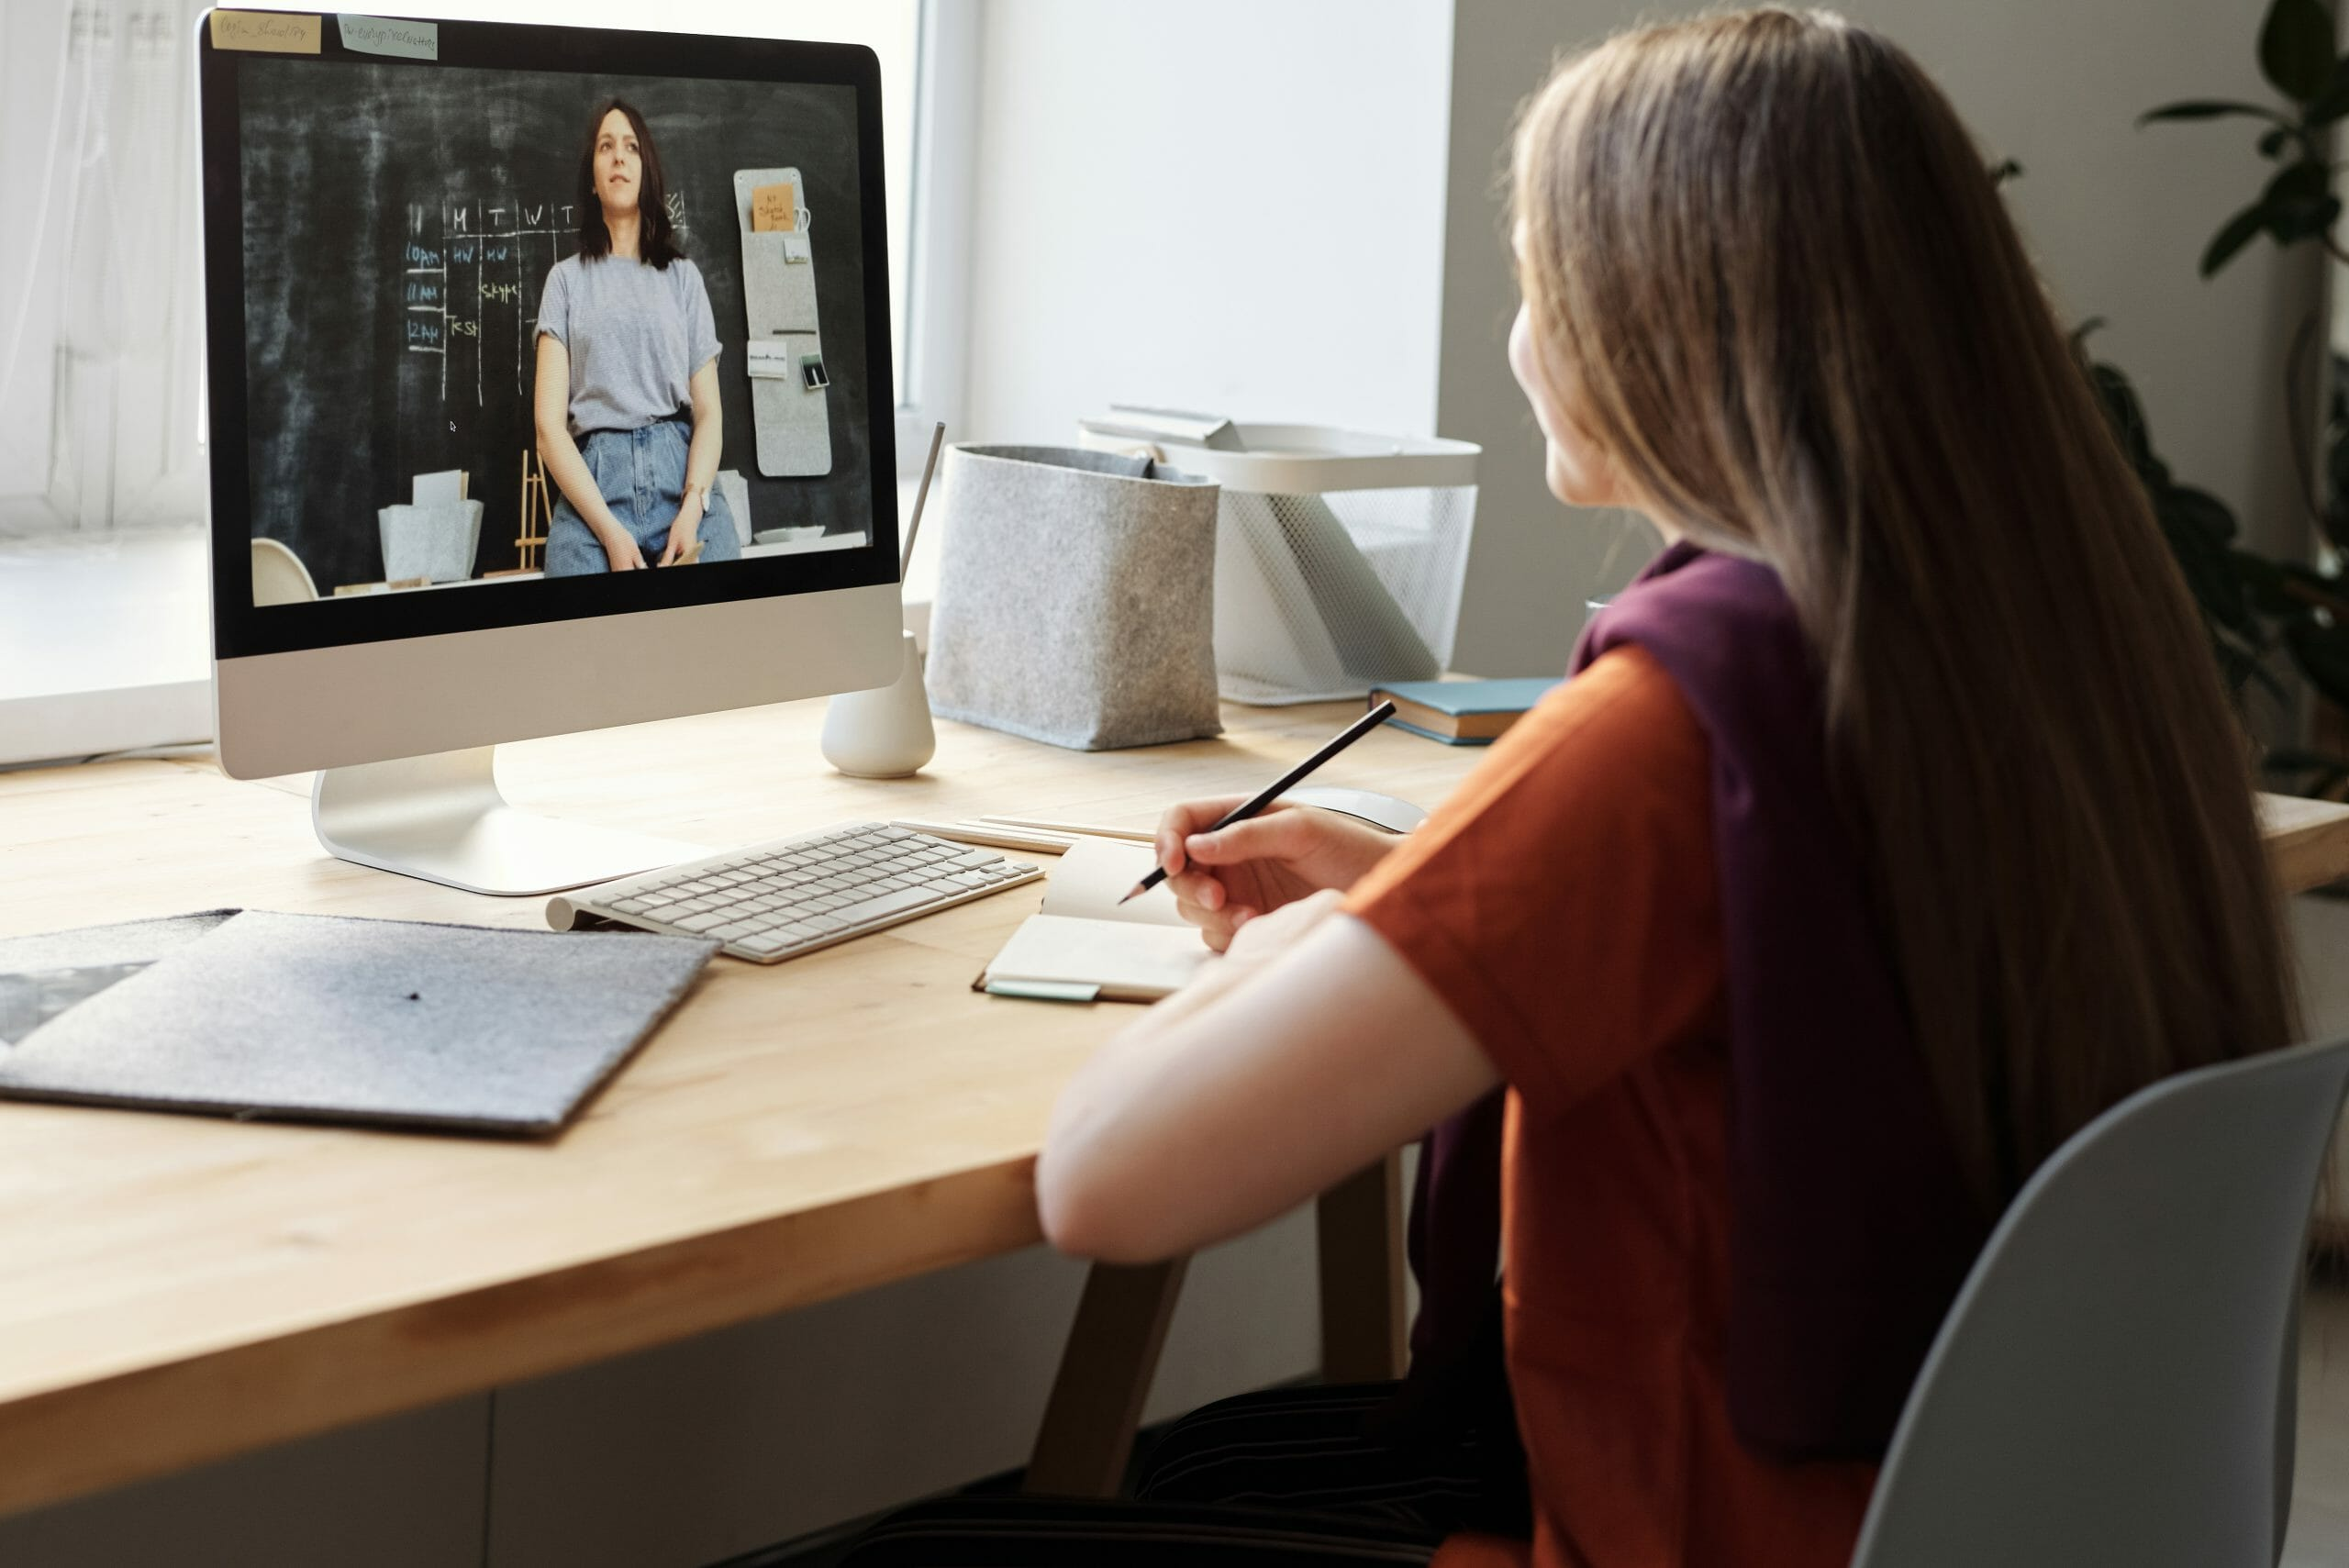 jakarta academics online learning